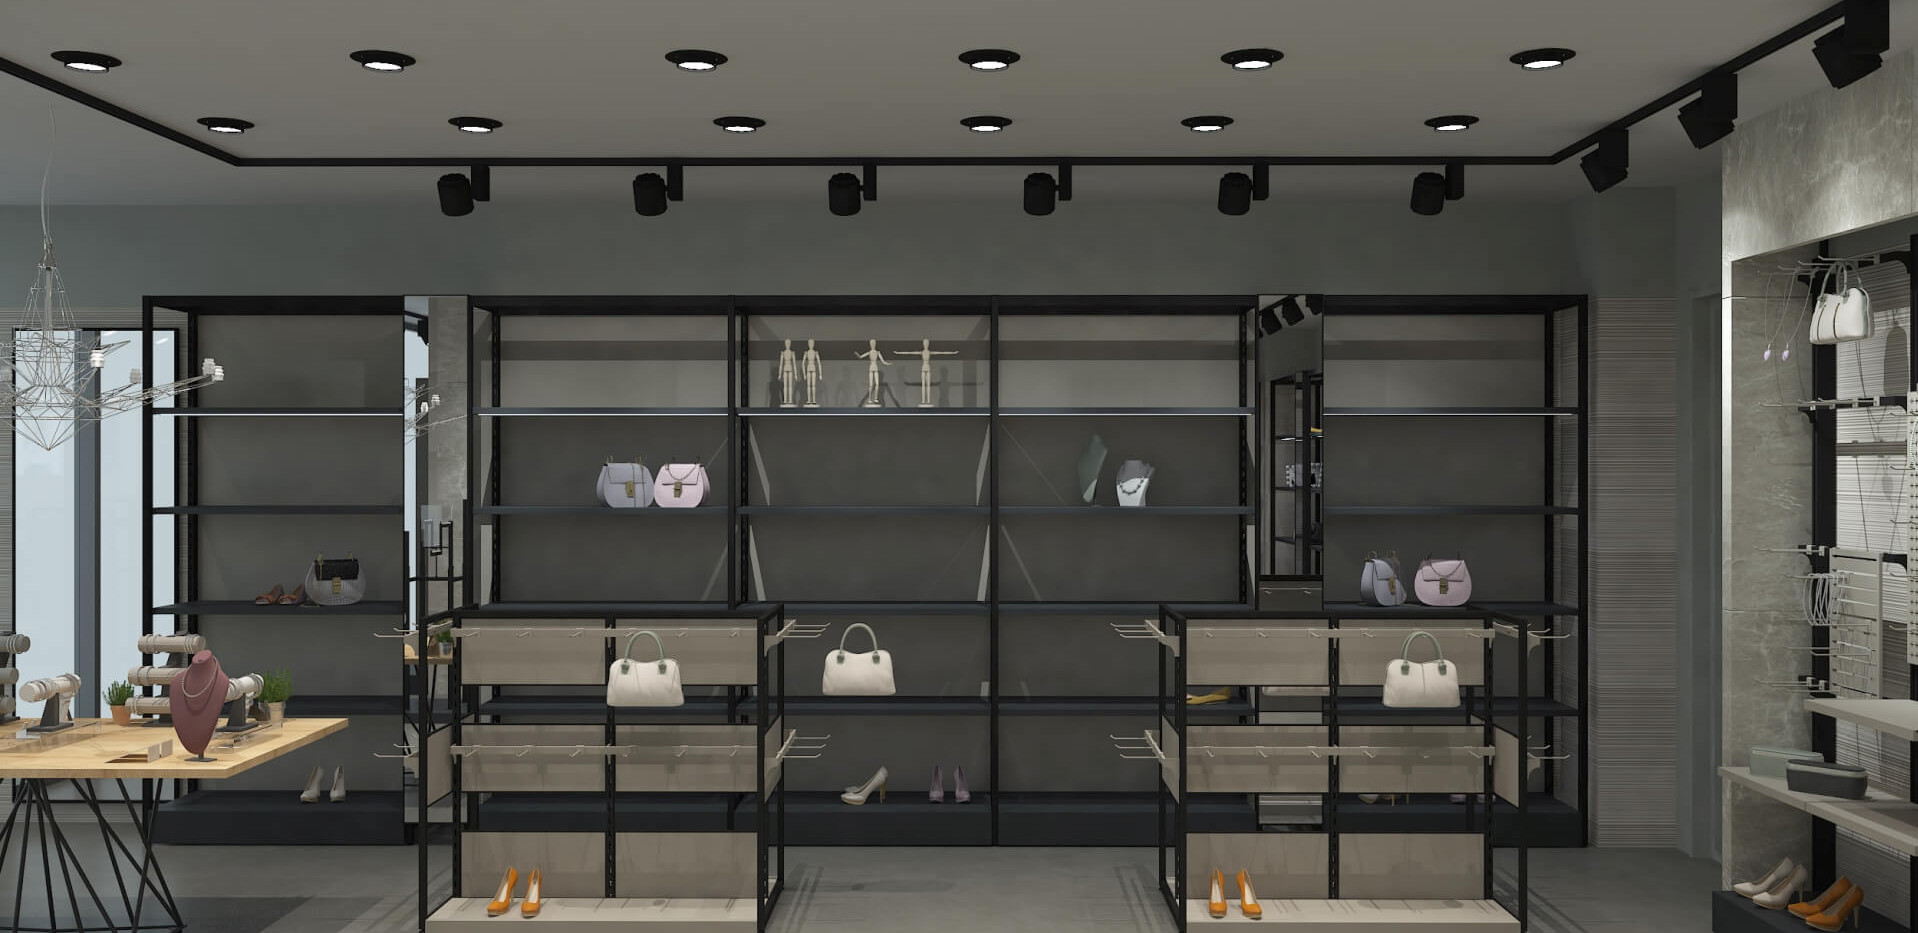 Corso - Shoes Store Shop Design-4.jpg